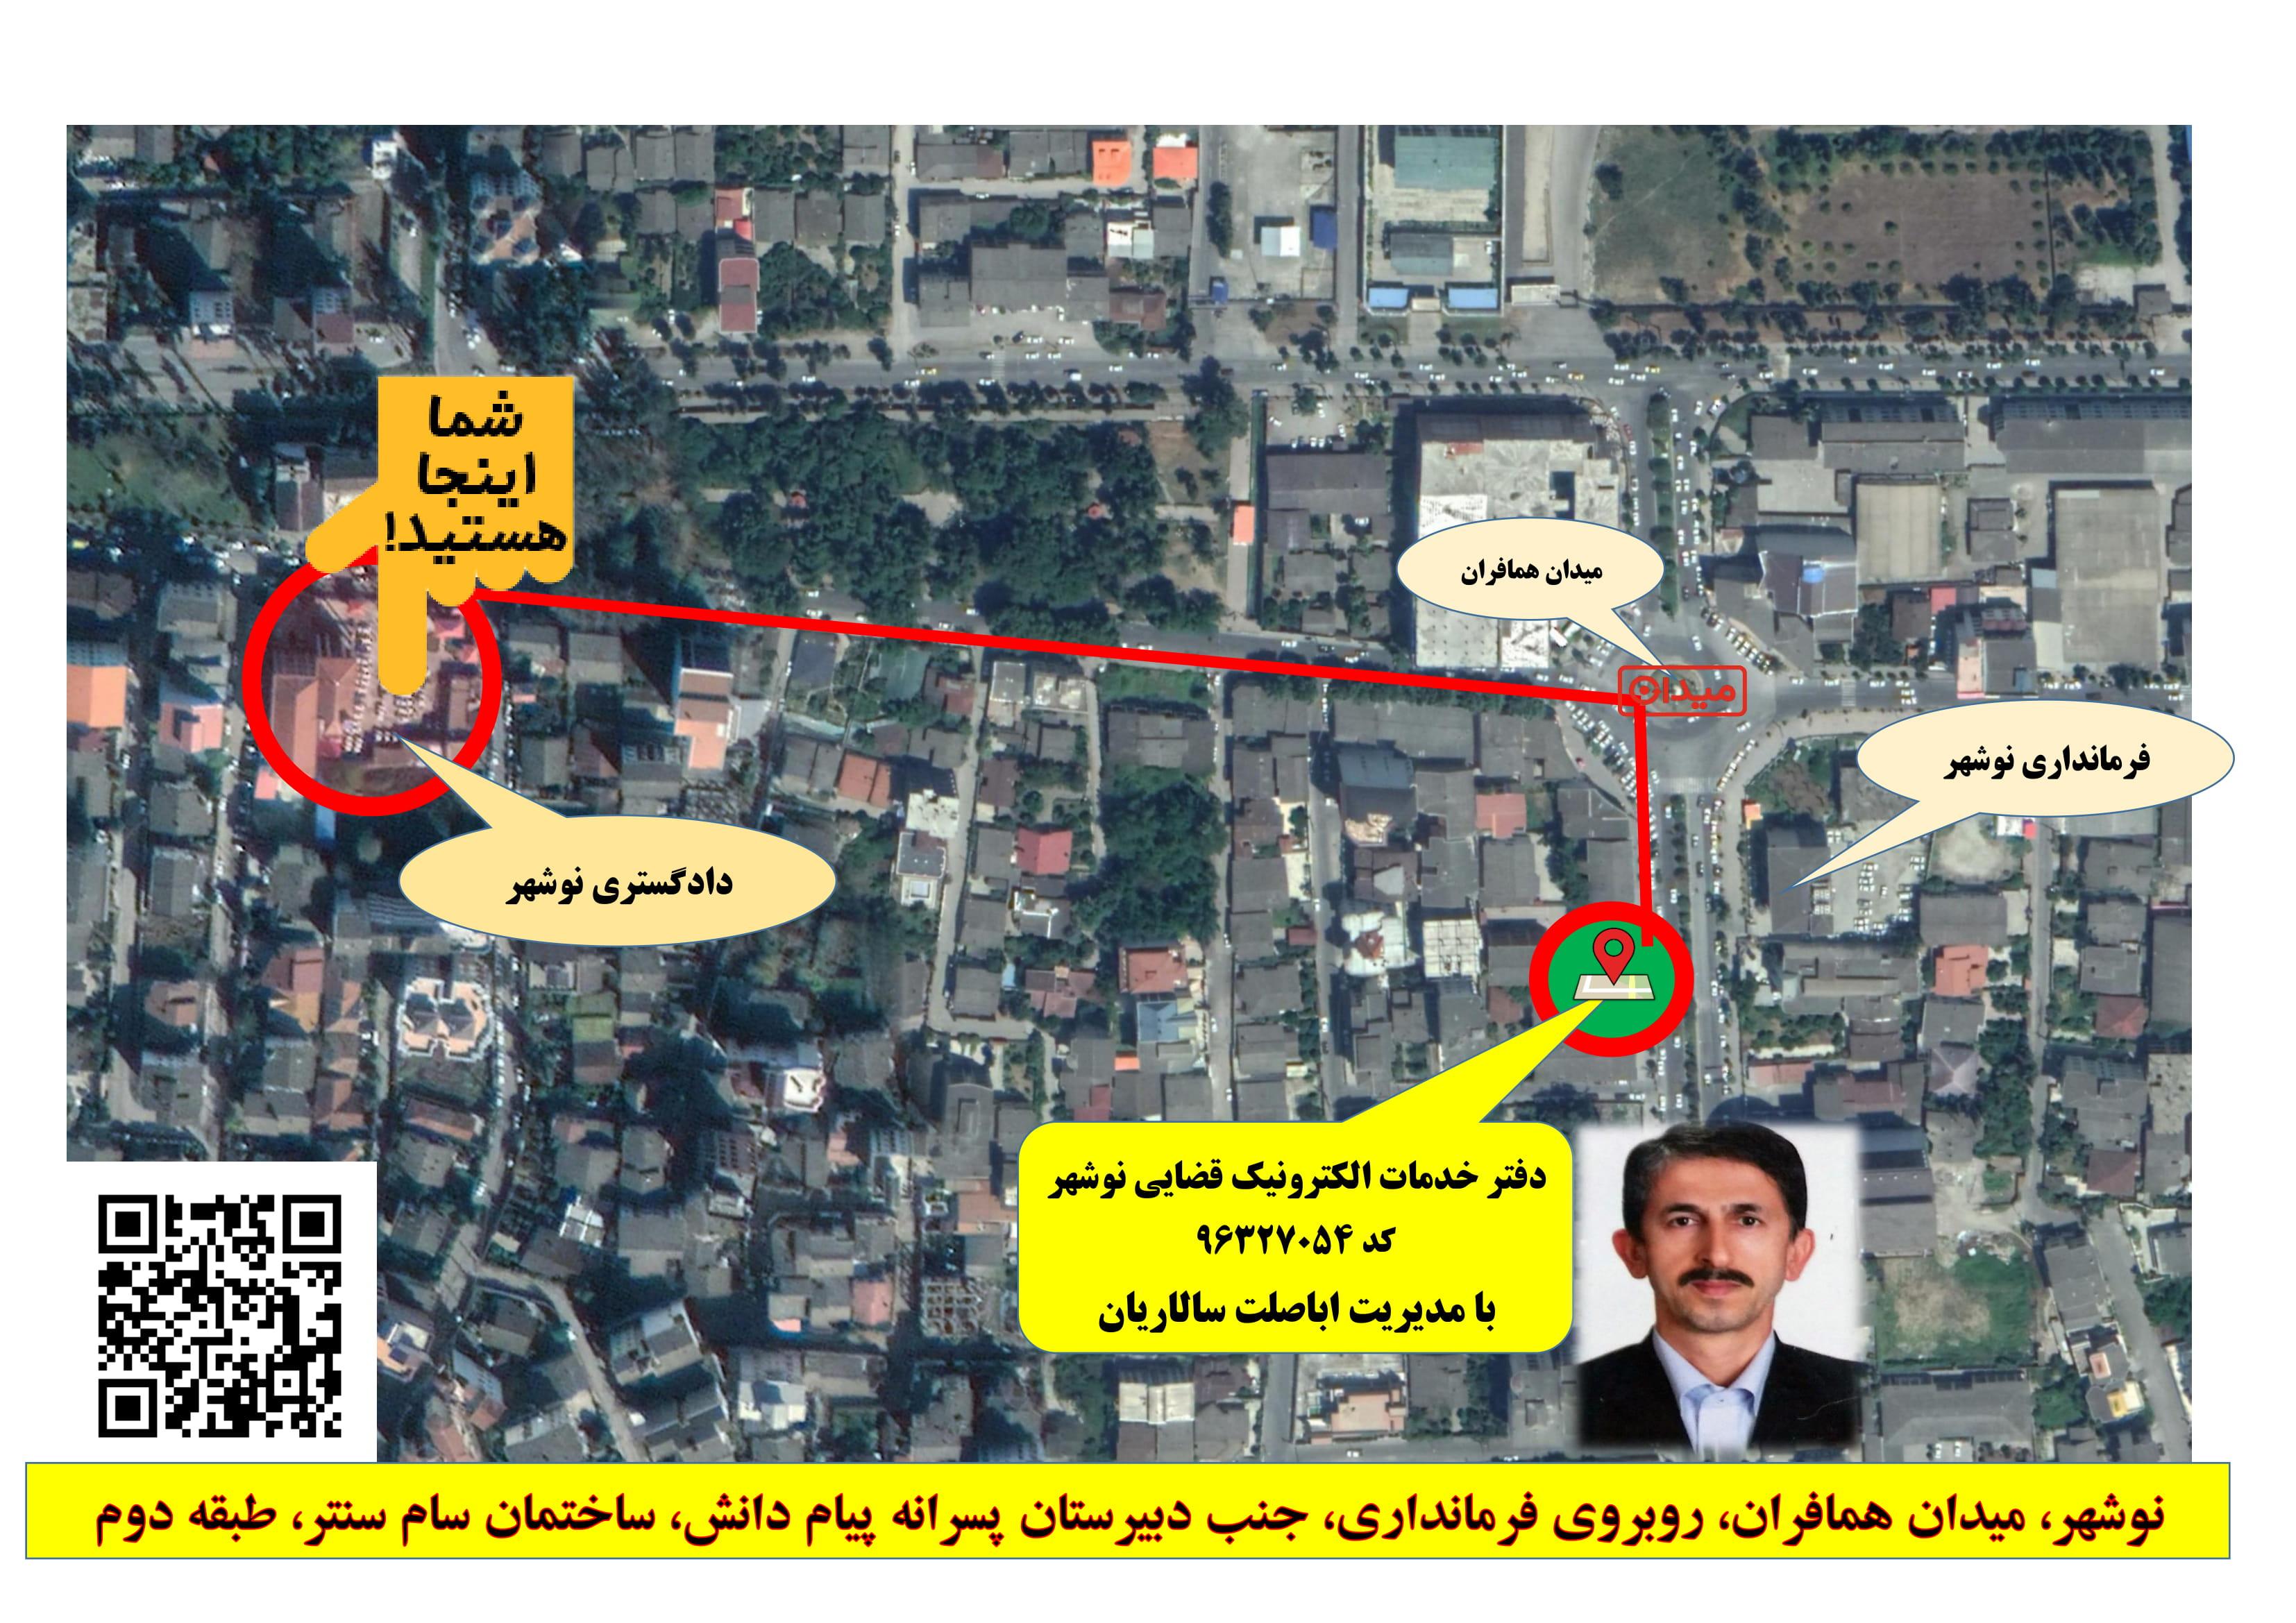 كروكي دفتر خدمات الكترونيك قضايي نوشهر-96327054-دادگستري همافران-روبروي فرمانداري